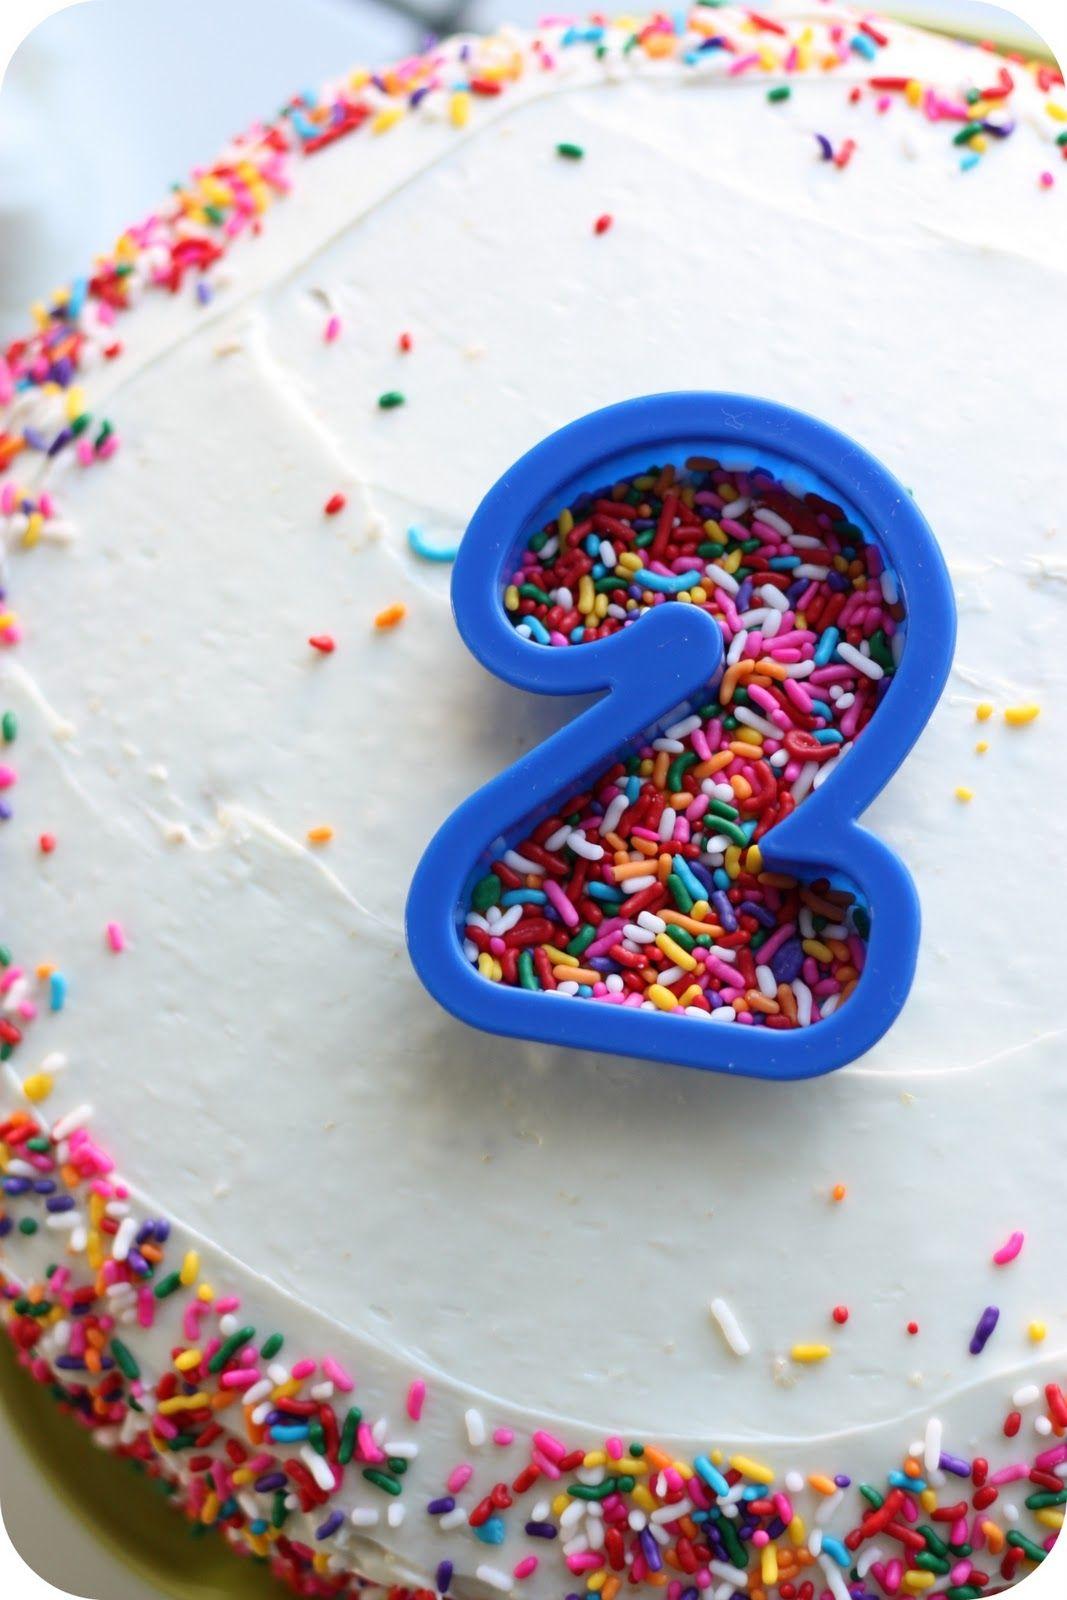 Tremendous Simple Homemade Birthday Cake Homemade Birthday Cakes Homemade Funny Birthday Cards Online Hendilapandamsfinfo